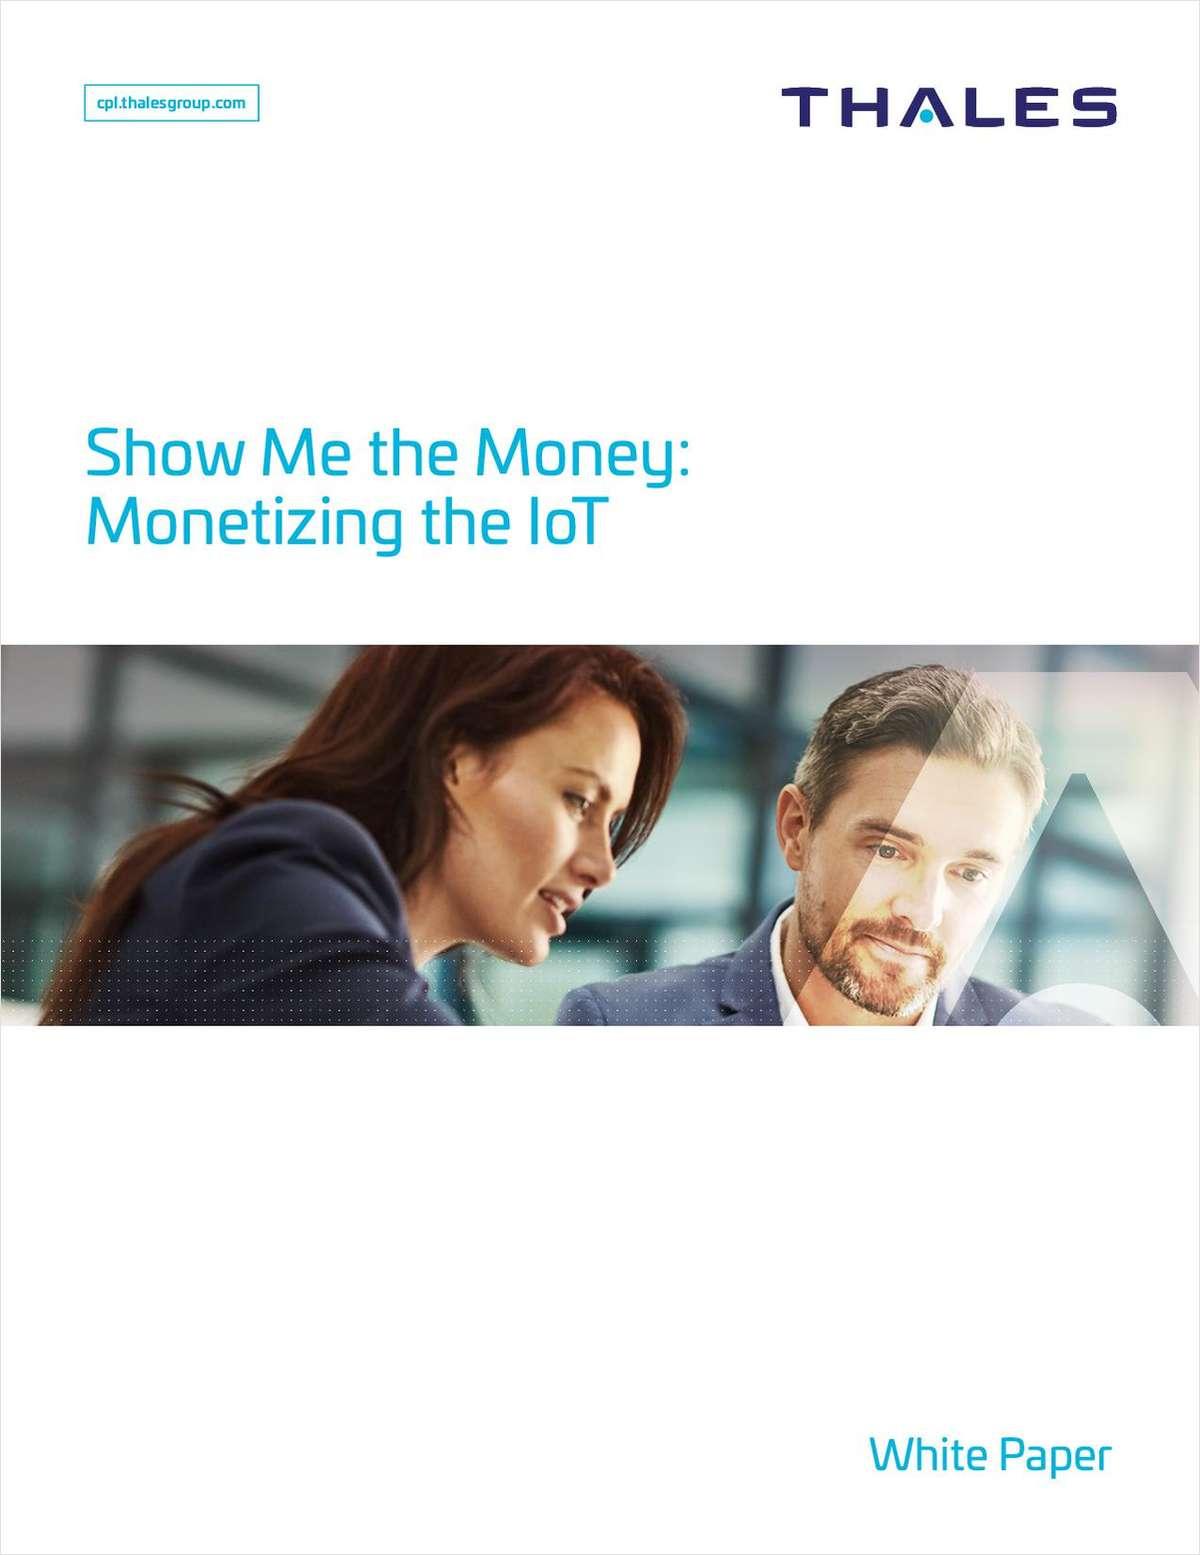 Show Me the Money: Monetizing the IoT